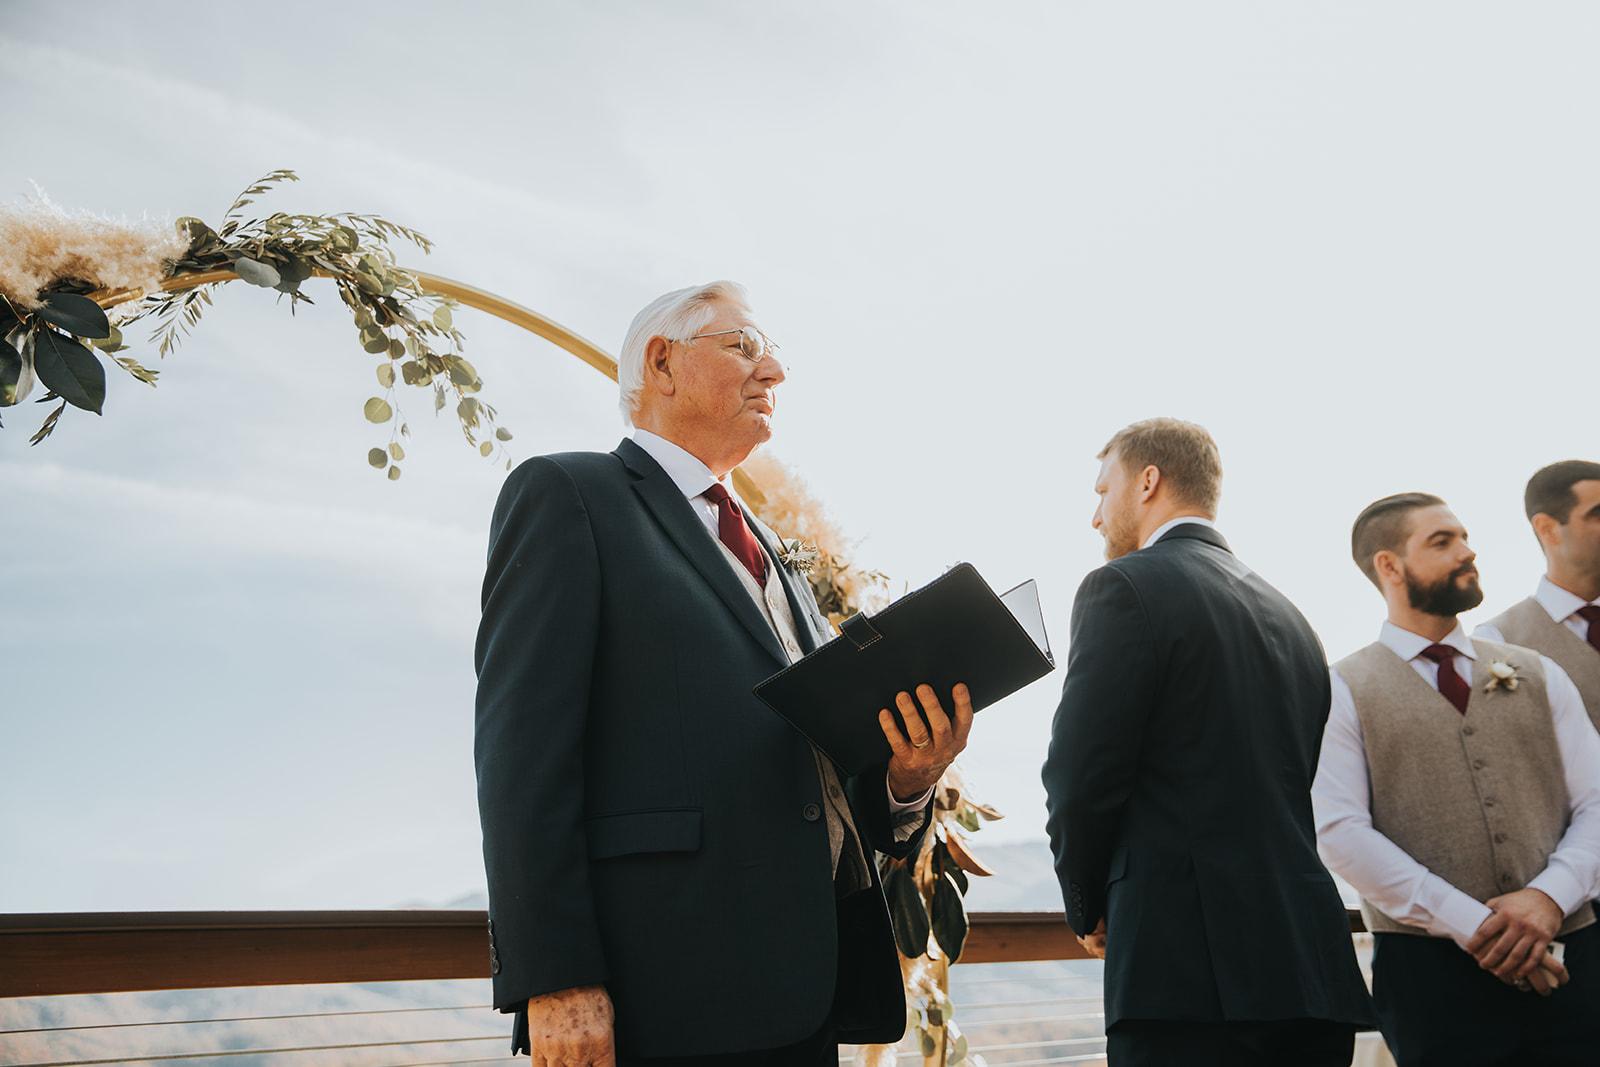 ceremony-9913.jpg